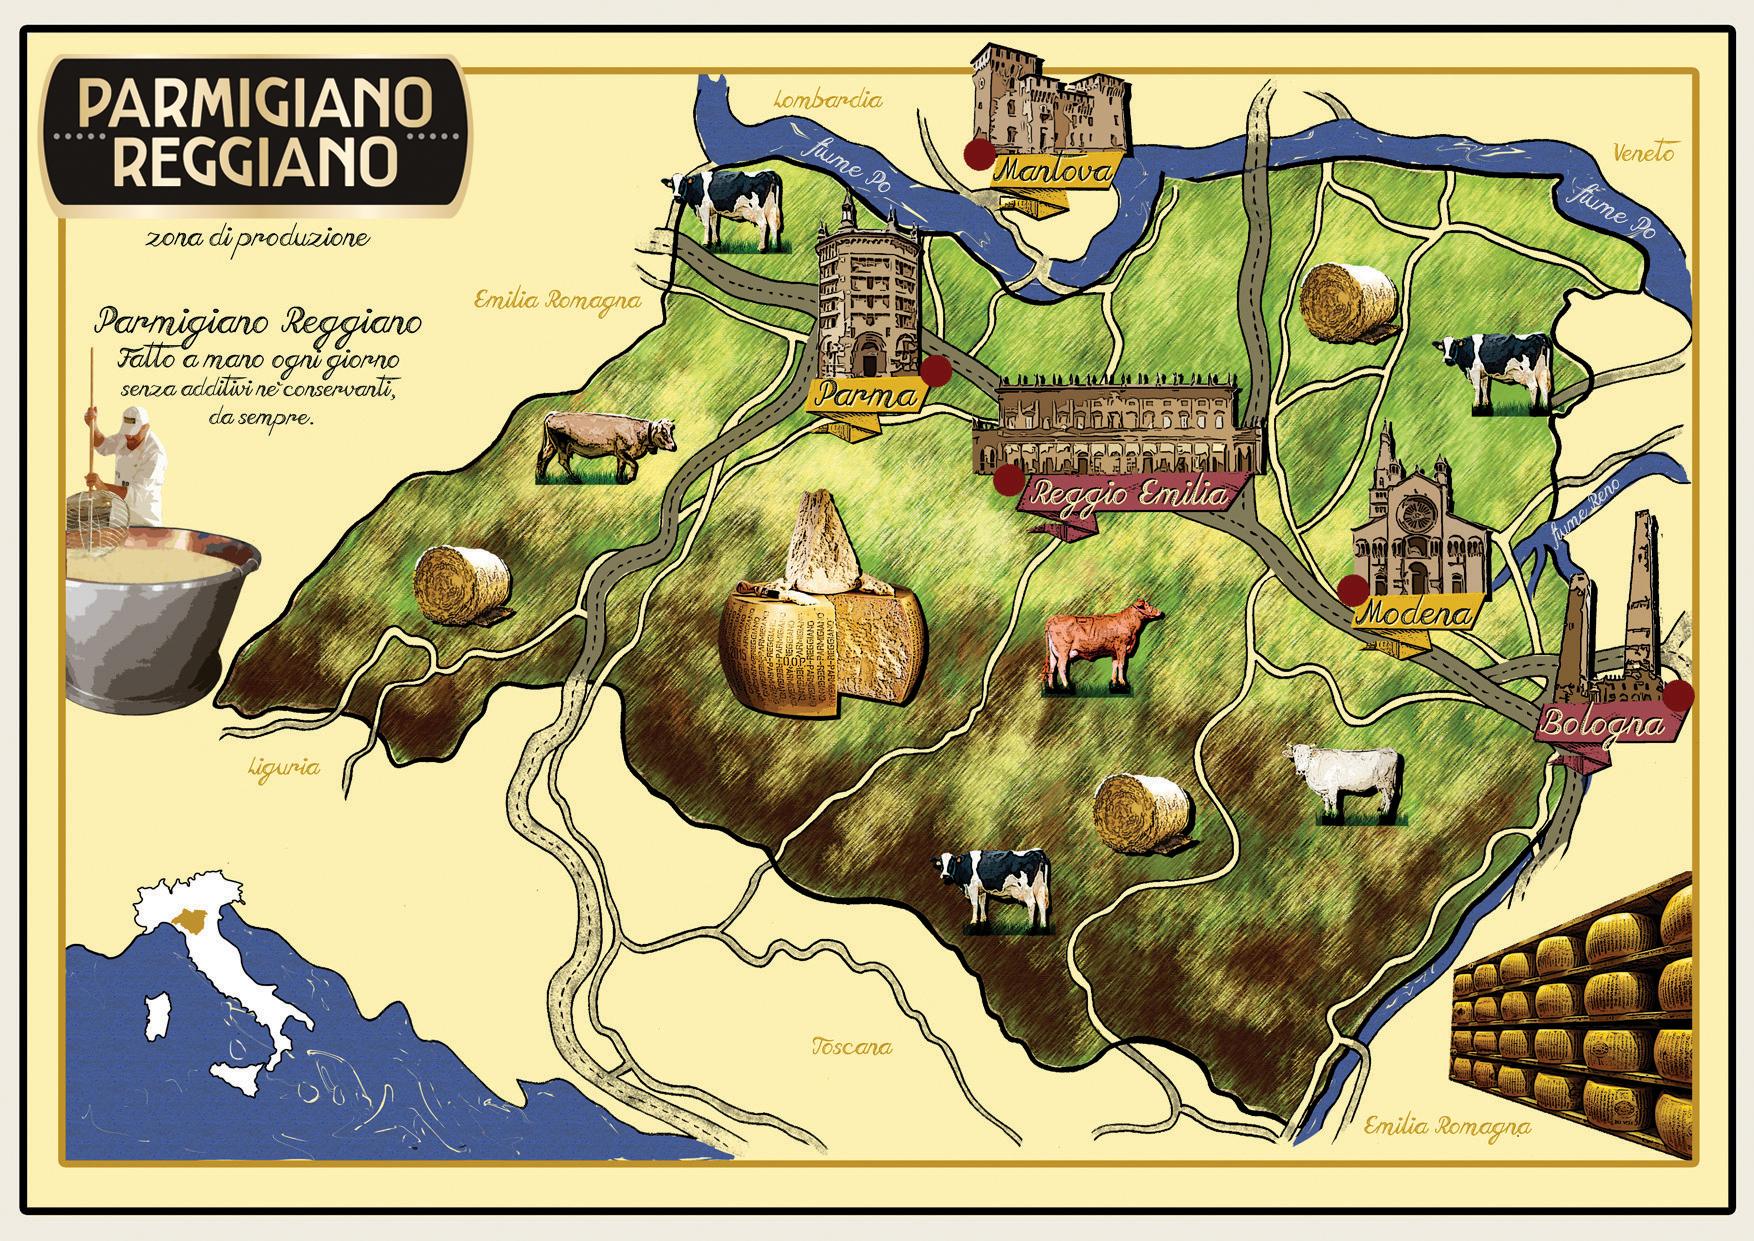 Map of Parmigiano Reggiano regions